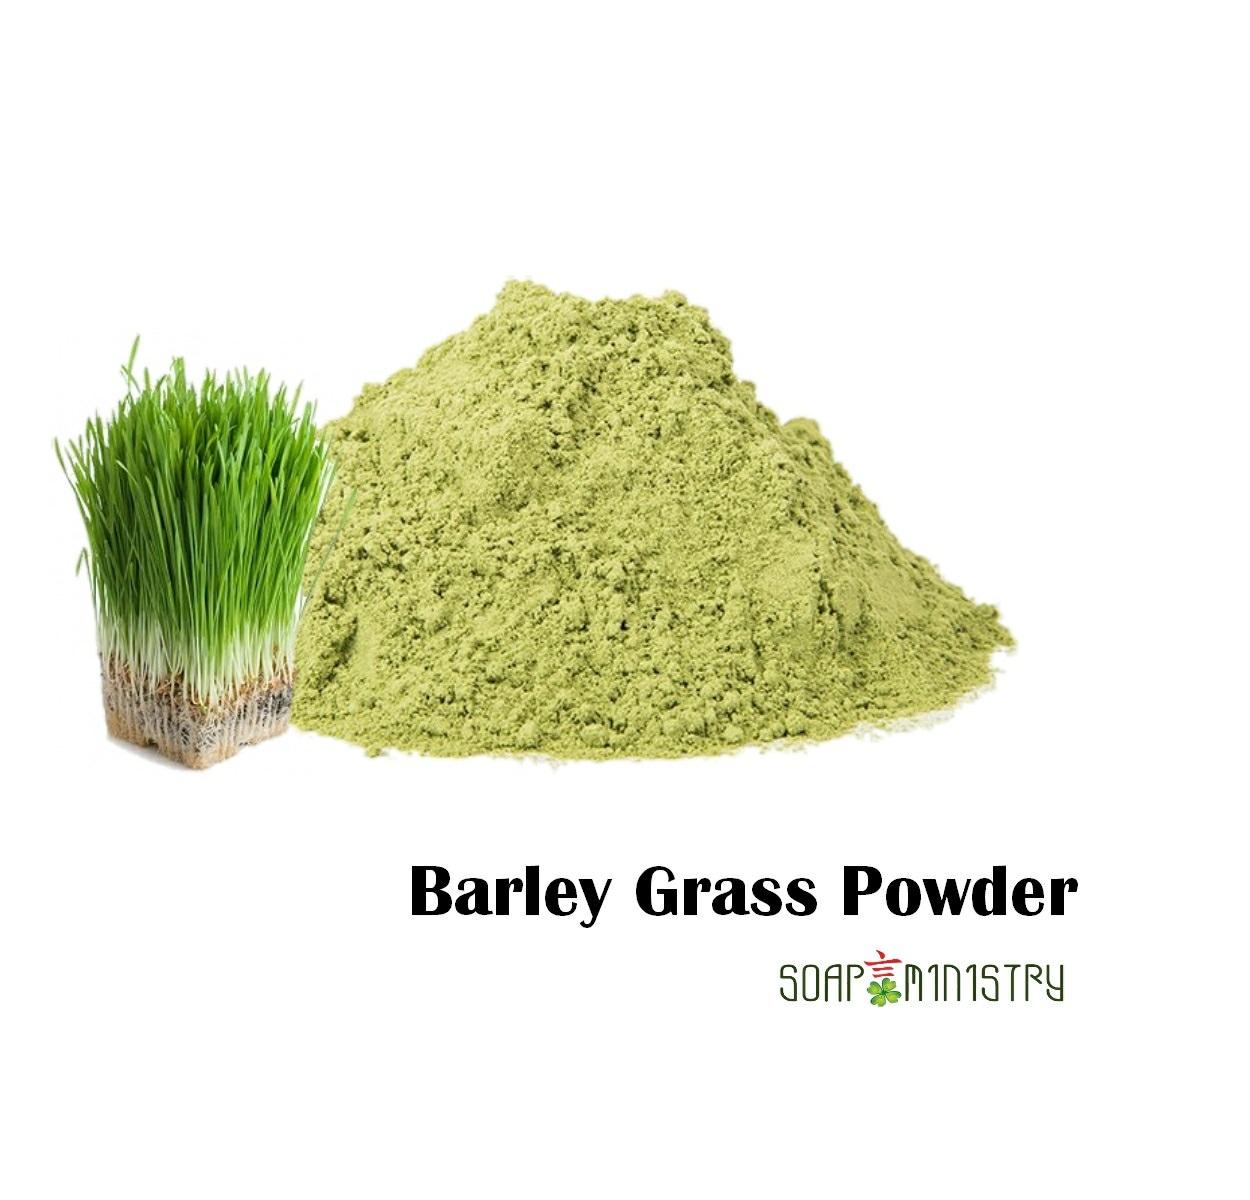 Barley Grass Powder 250g